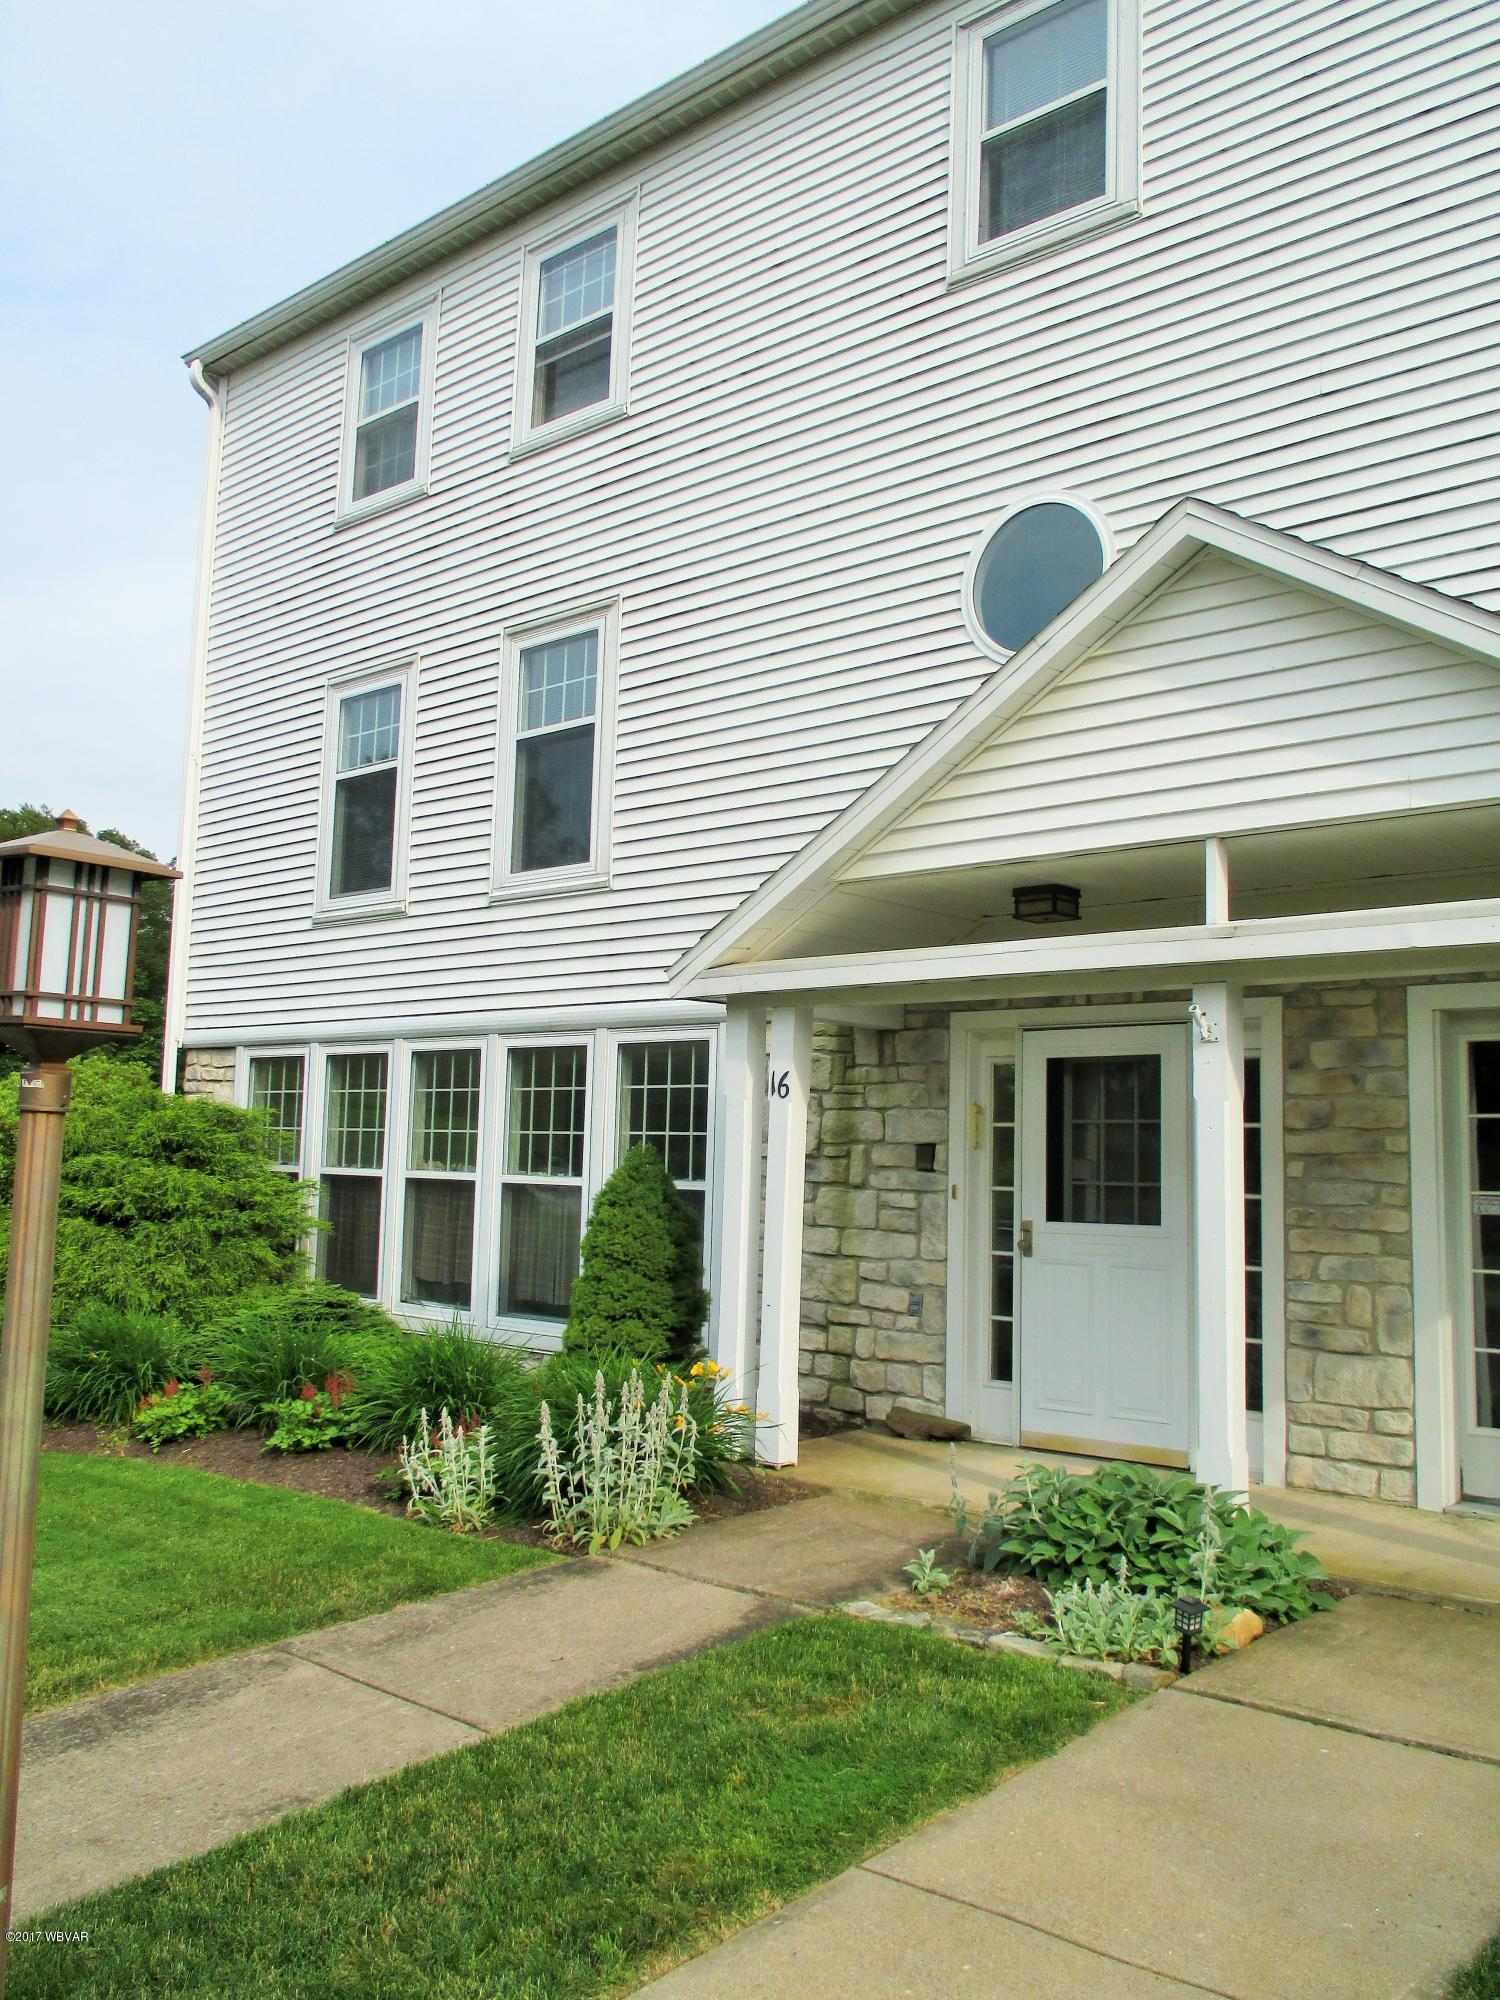 163 CRESTMONT DRIVE,Eagles Mere,PA 17731,3 Bedrooms Bedrooms,3 BathroomsBathrooms,Residential,CRESTMONT,WB-81314